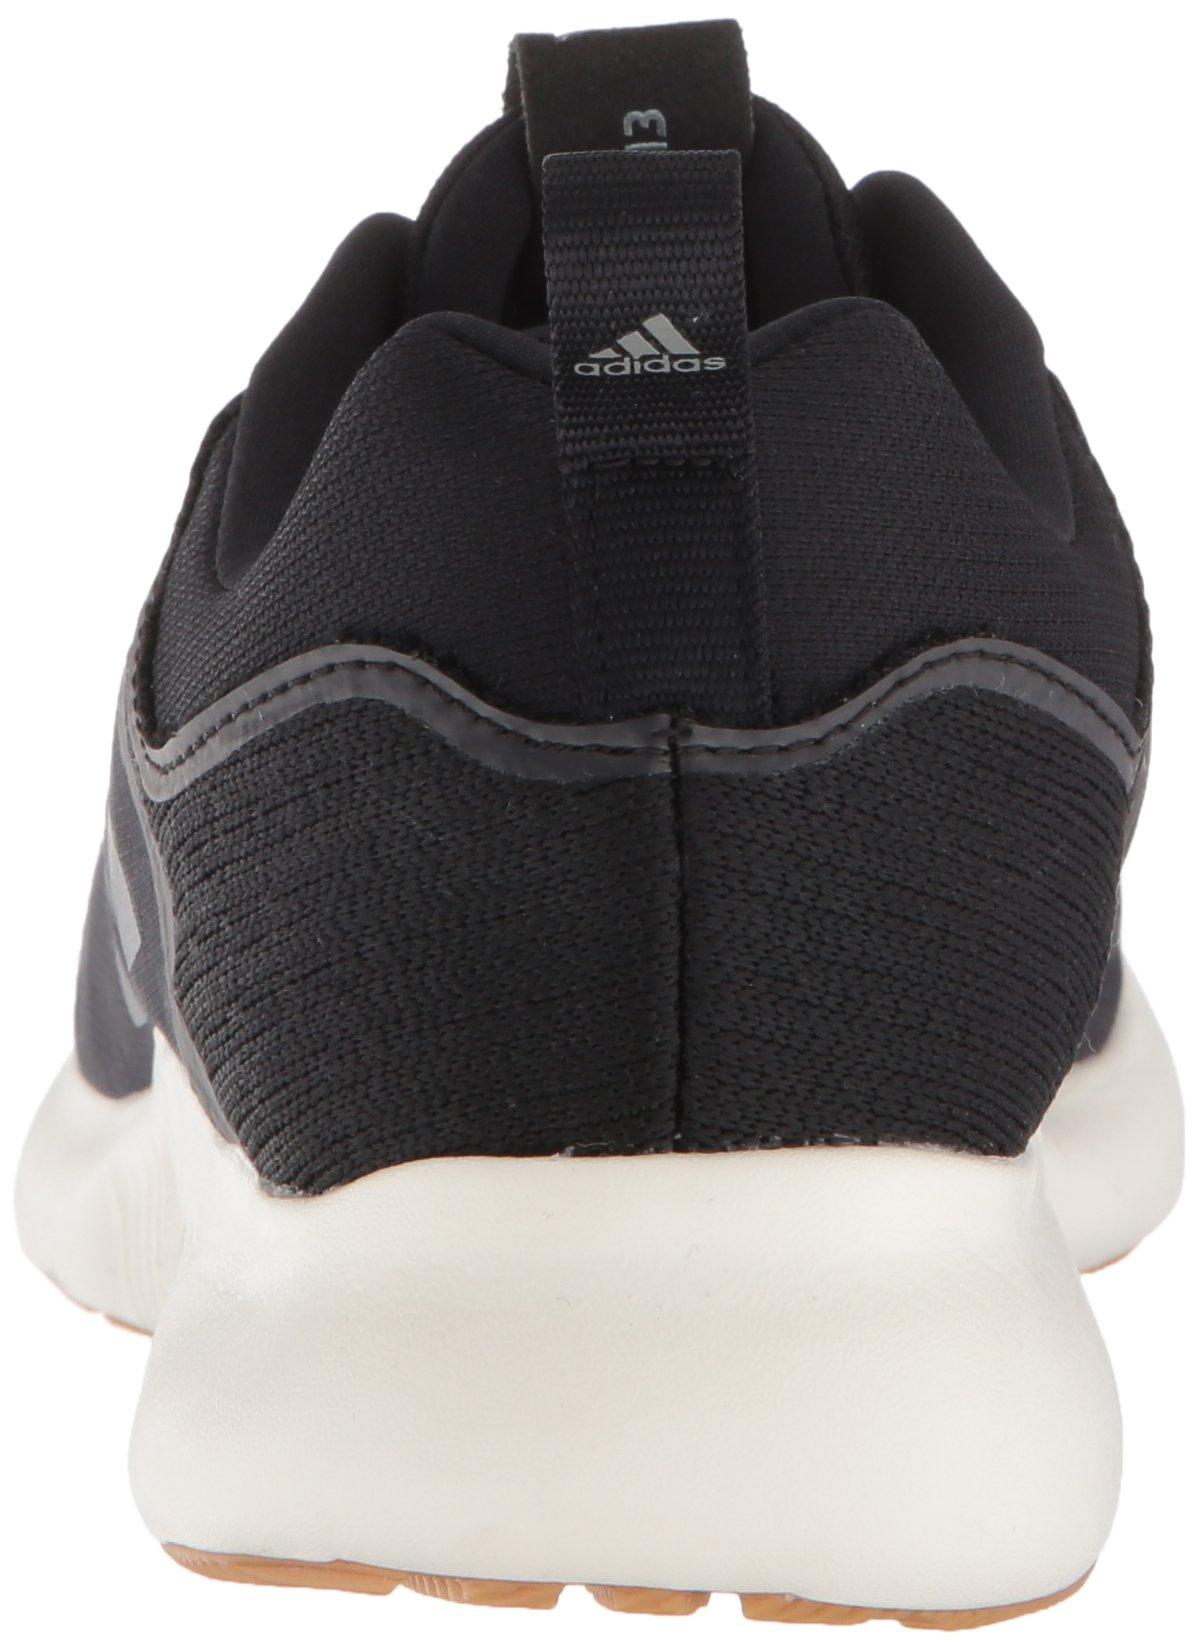 adidas Women's Edgebounce Running Shoe Black/Night Metallic, 5.5 M US by adidas (Image #2)